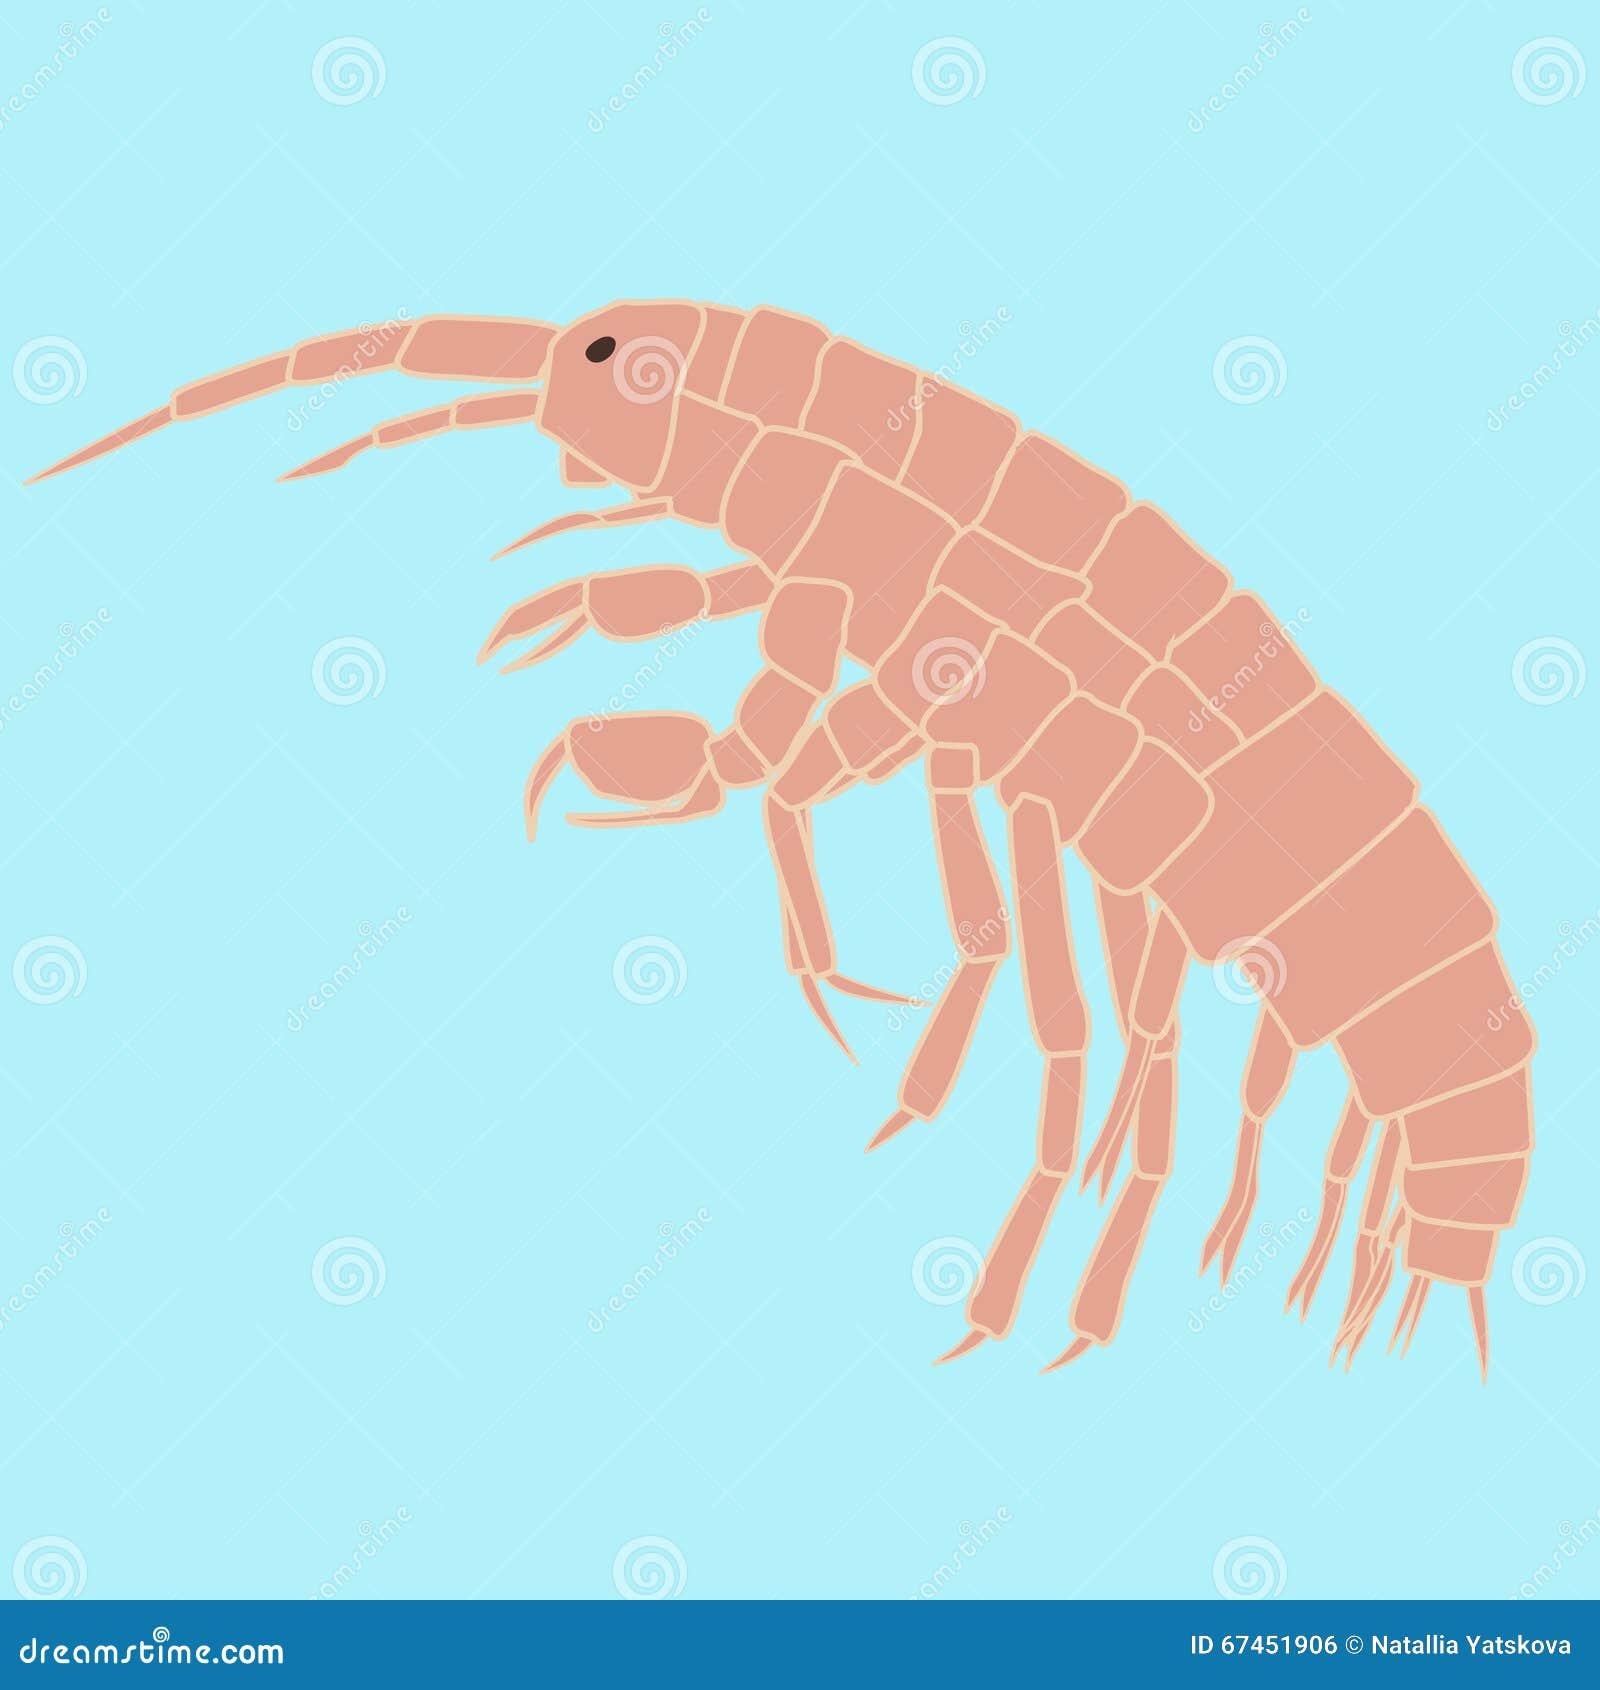 Amphipoda Small Animal Planktonic Organism Stock Vector